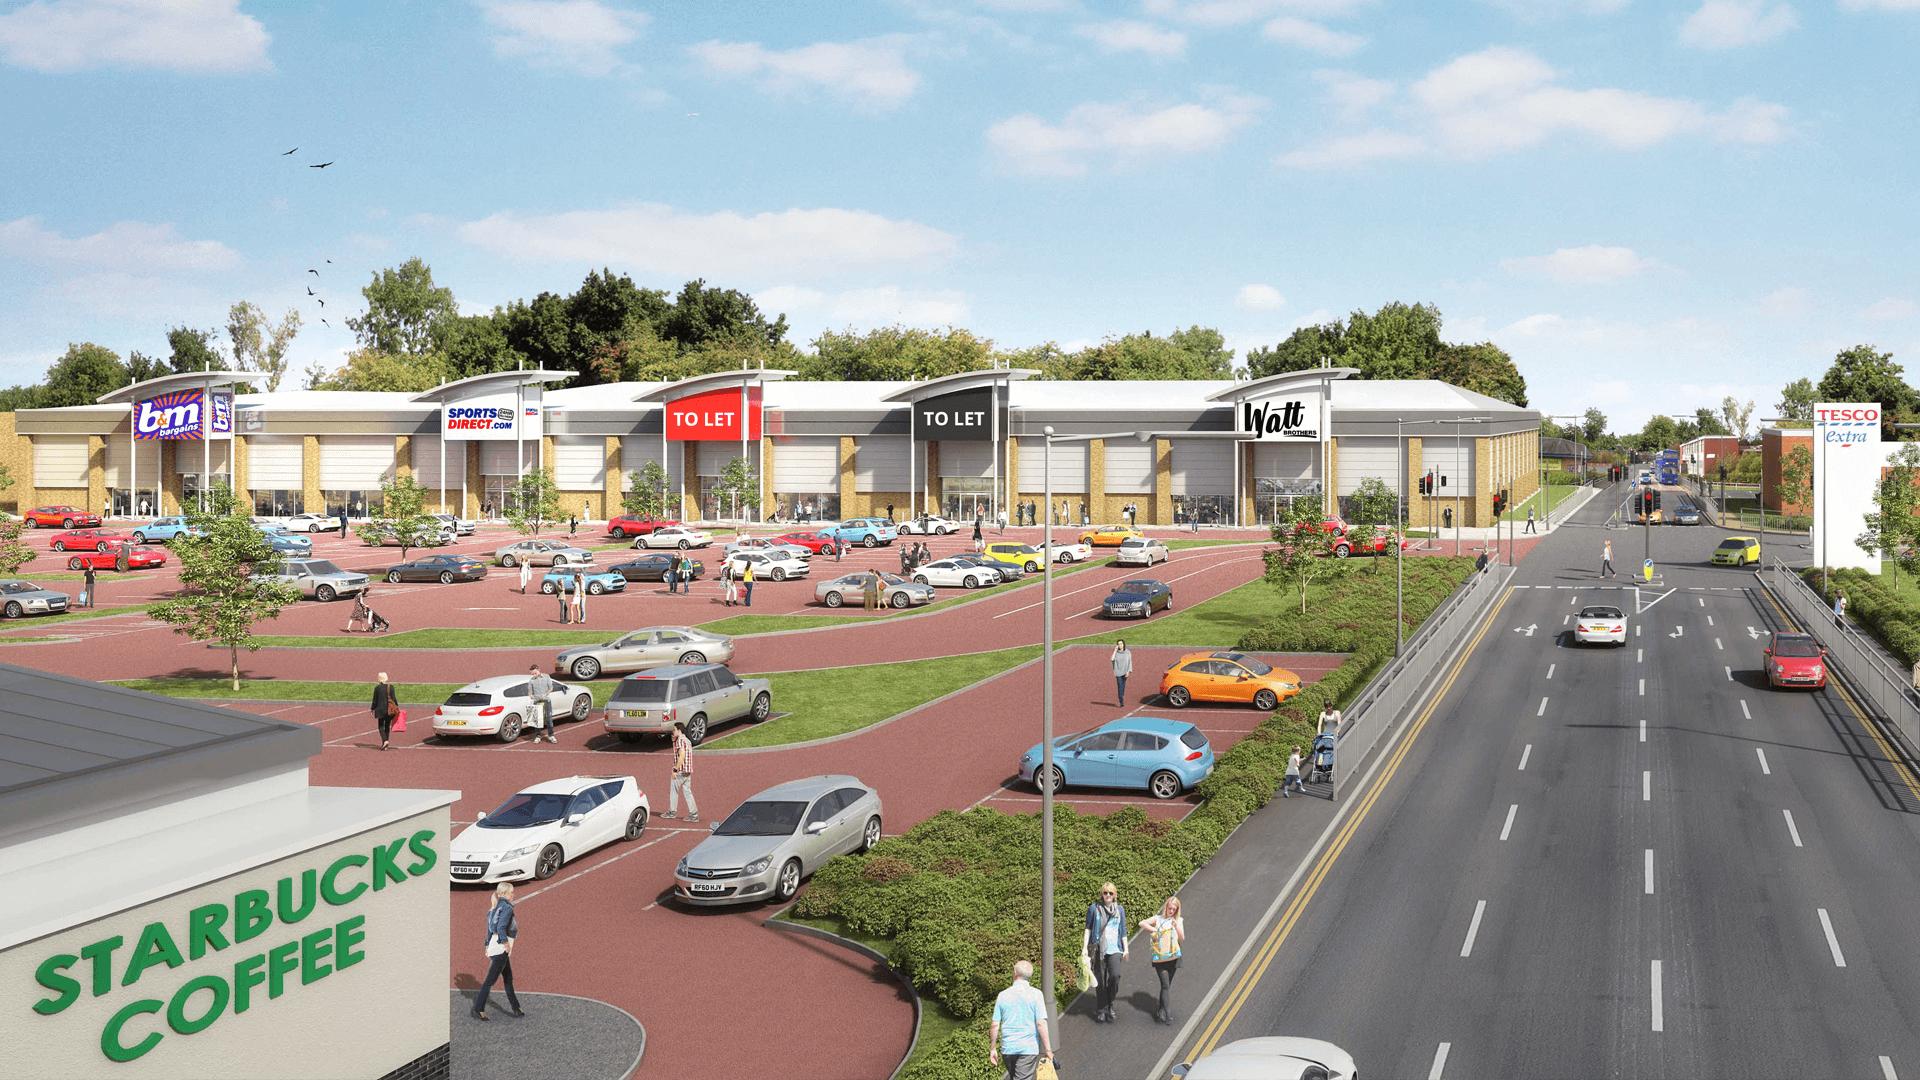 Glencairn Retail Park, Kilmarnock